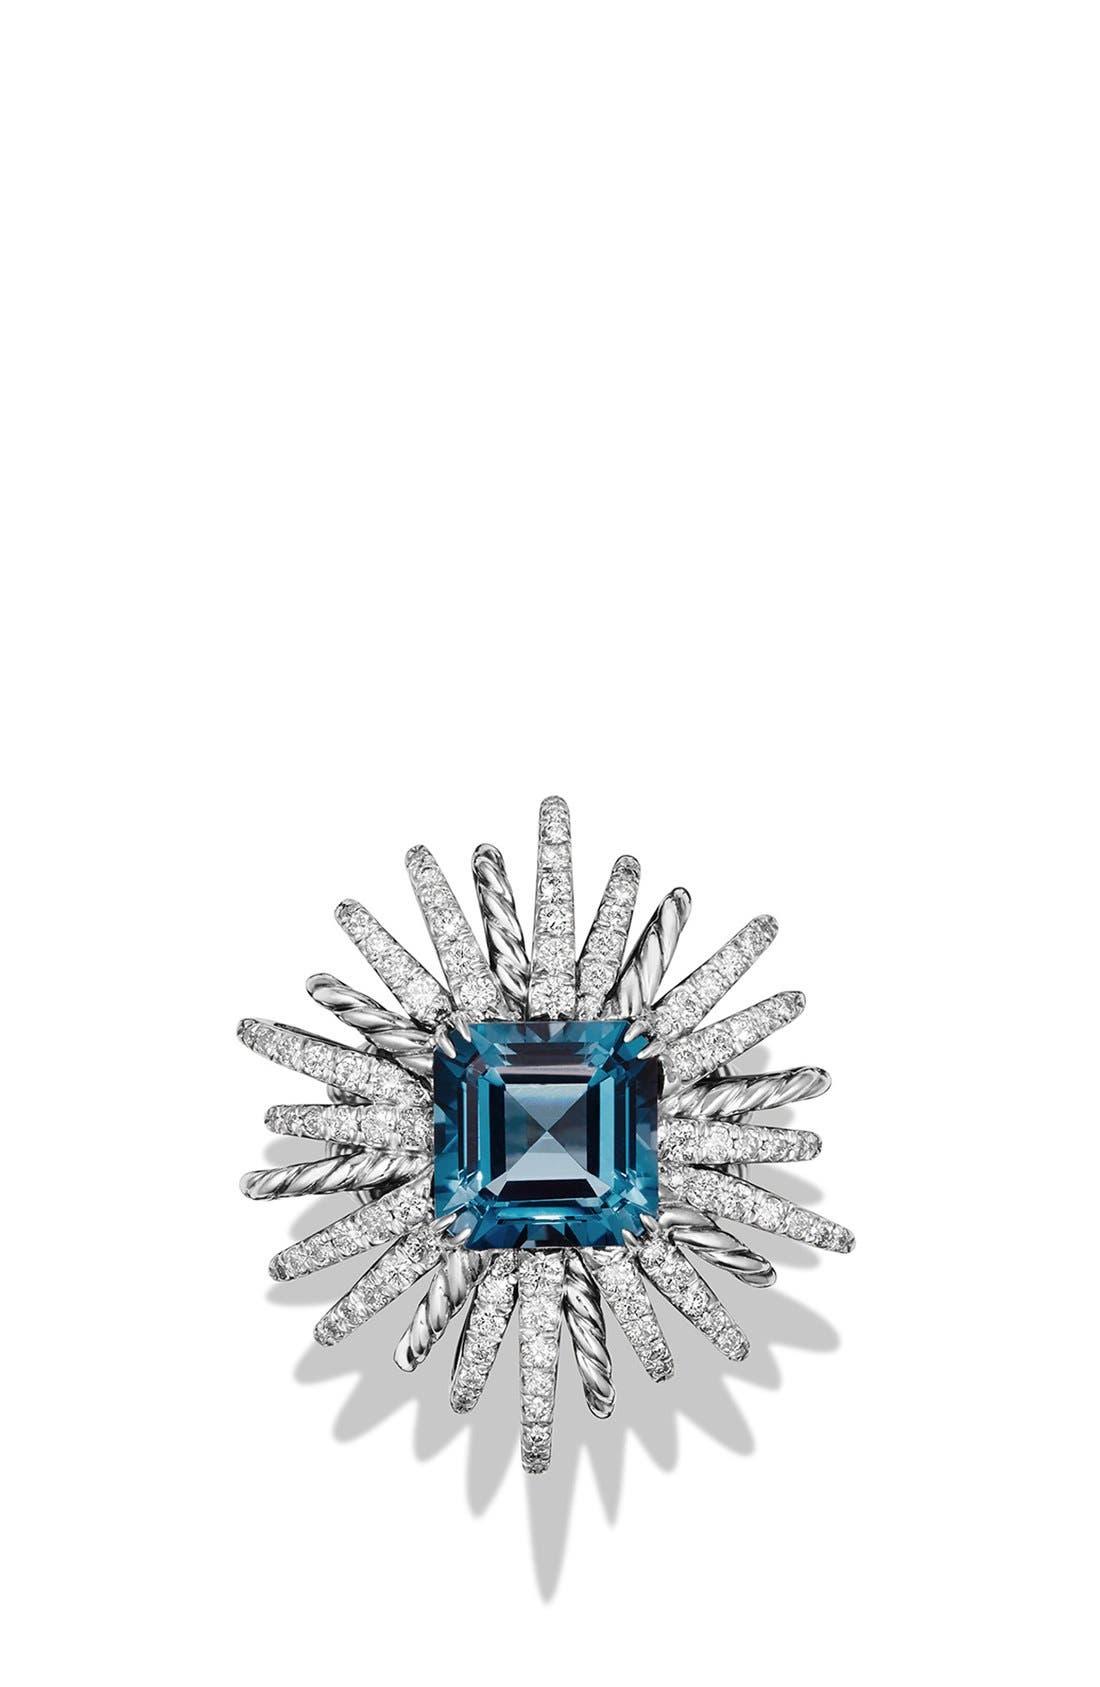 'Starburst' Ring with Semiprecious Stone and Diamonds,                             Alternate thumbnail 2, color,                             Hampton Blue Topaz